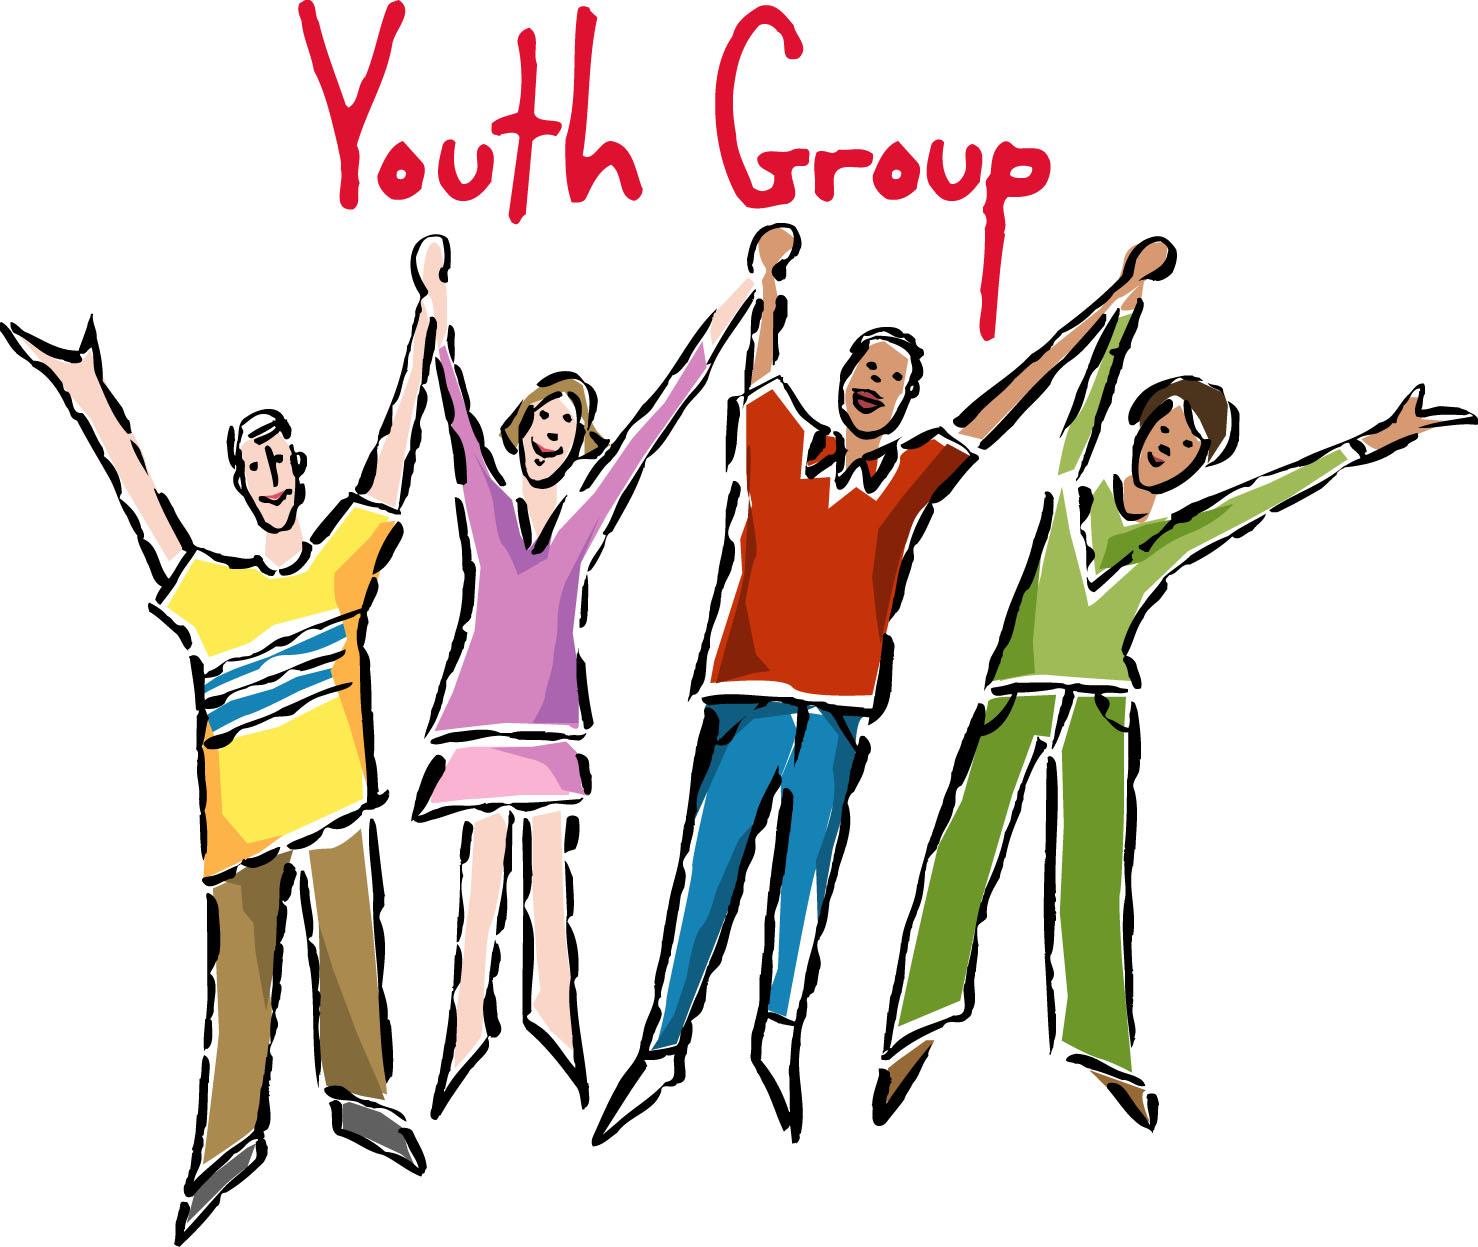 hight resolution of youth abundant life united pentecostal church clipart